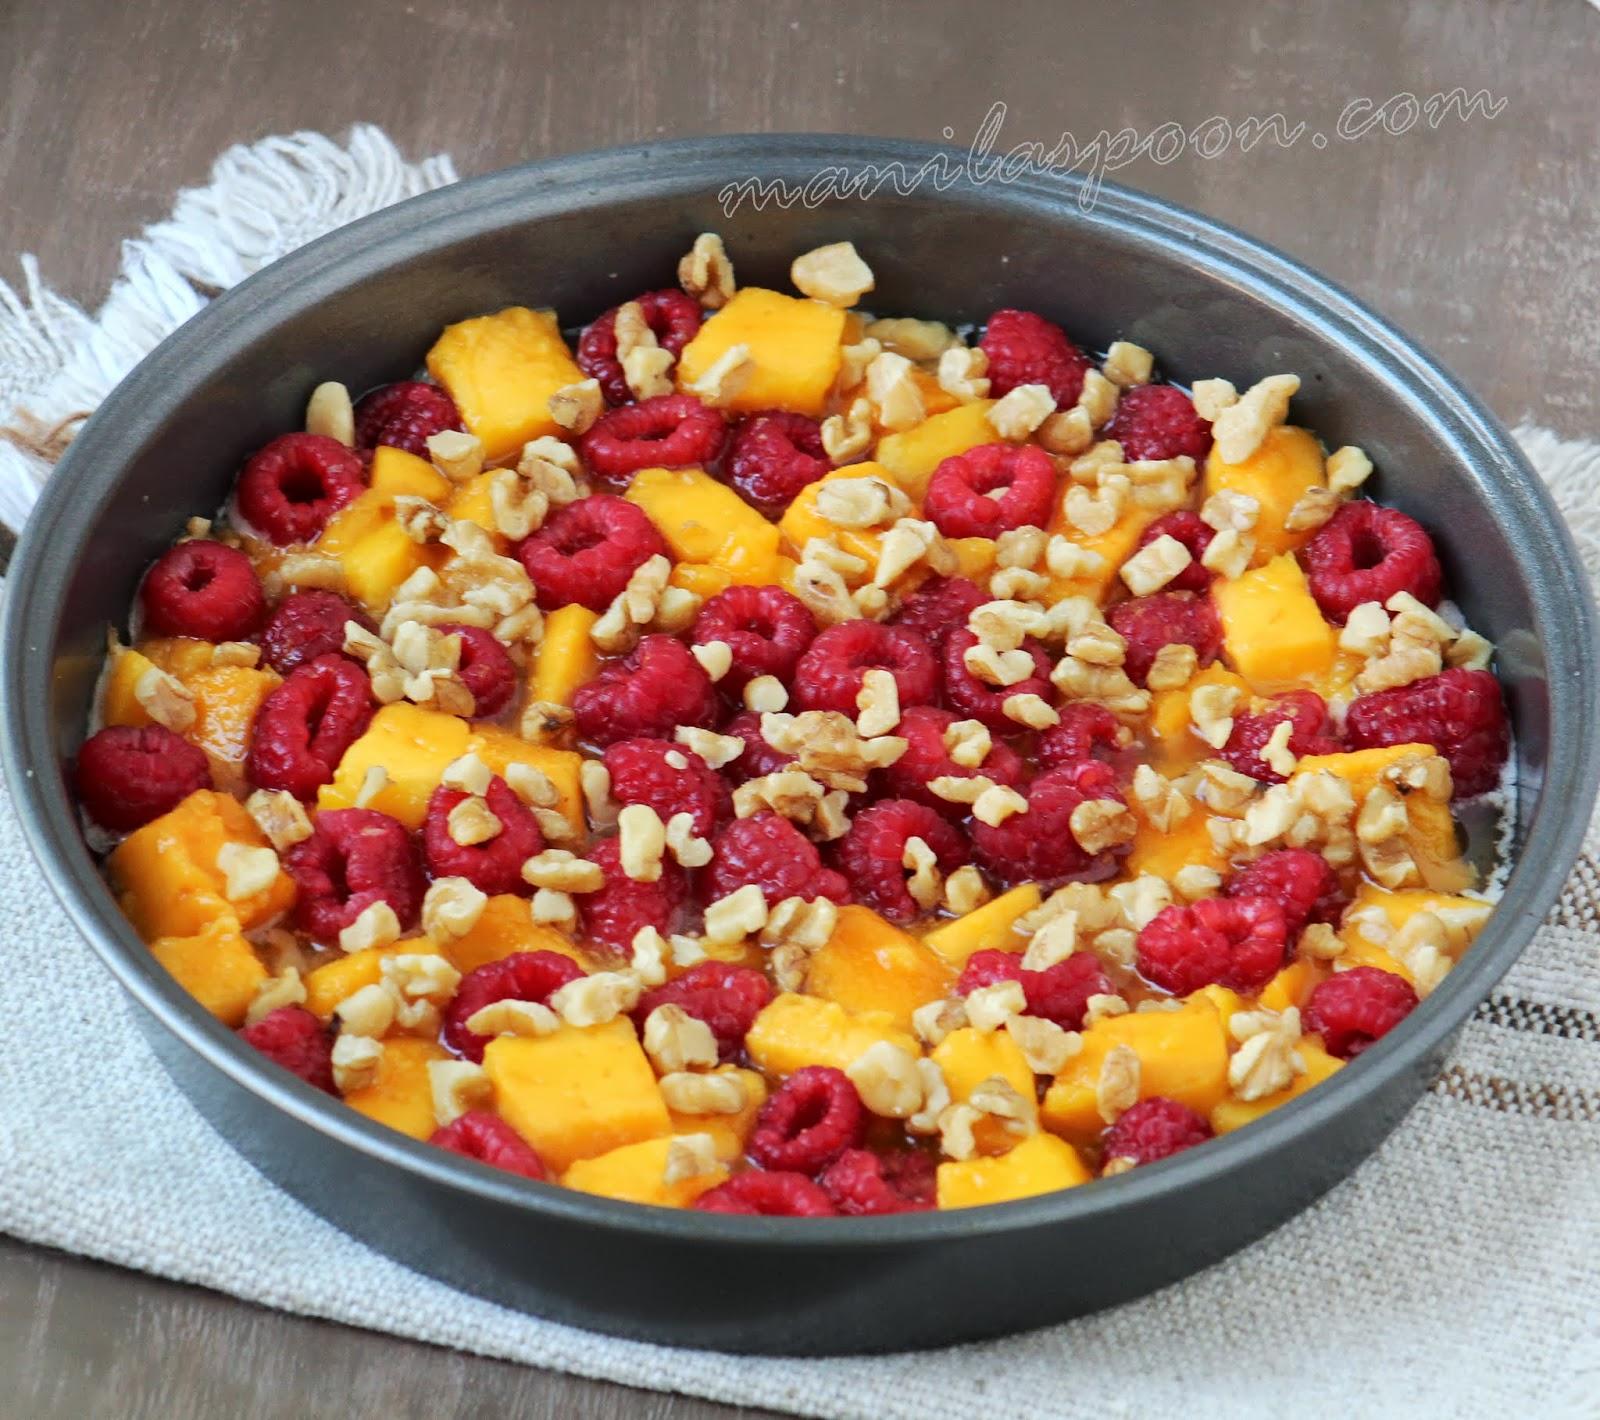 down cake recipe yummly mango upside down cake with macadamia nuts